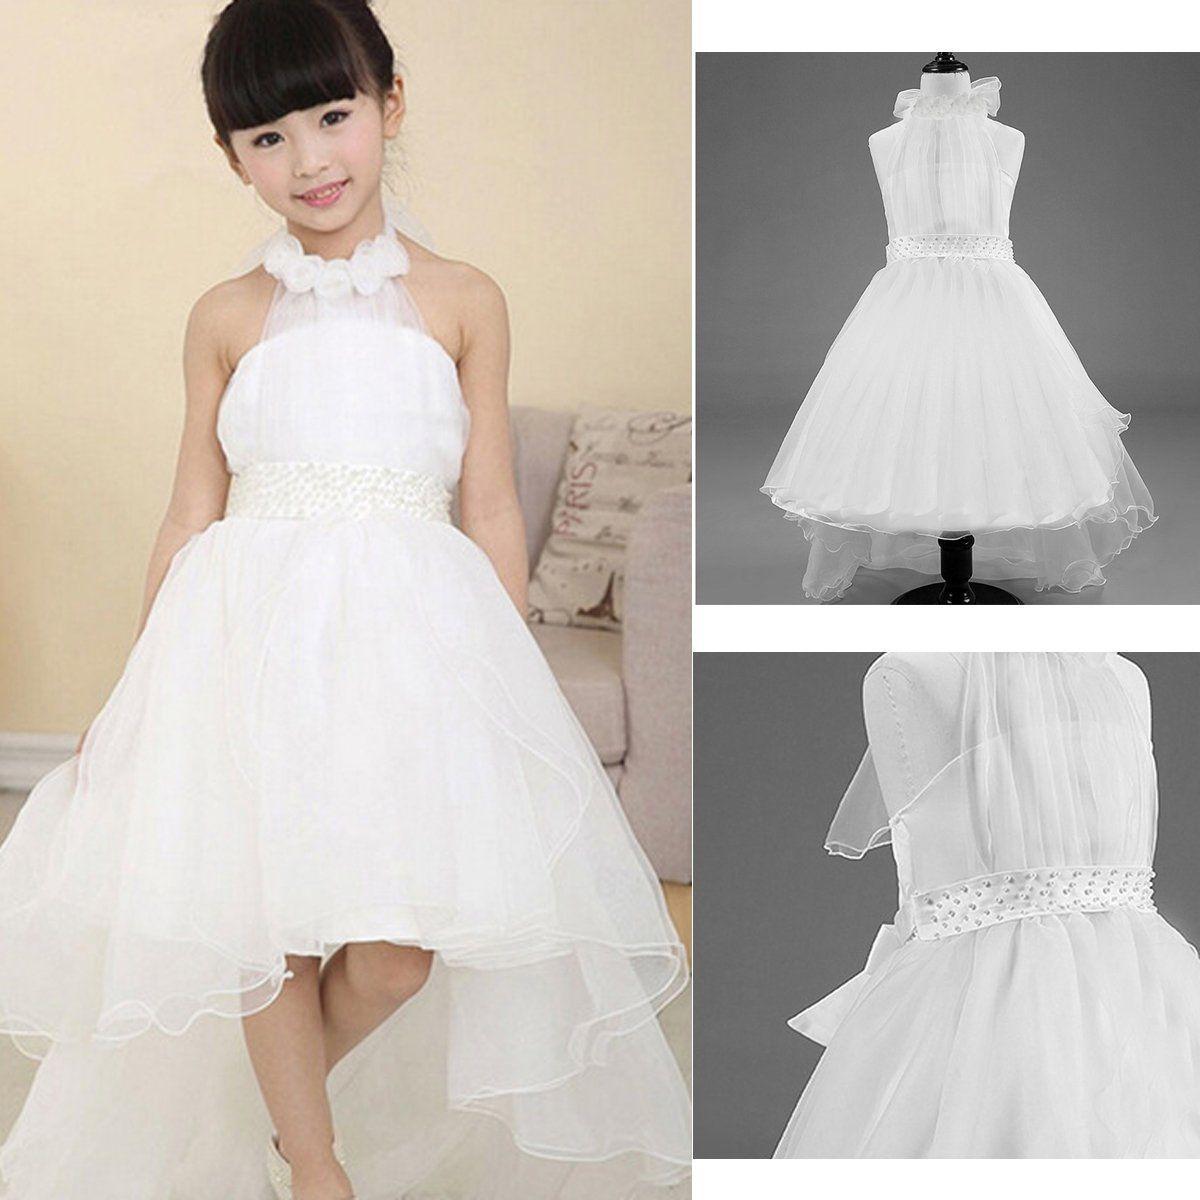 Flower Girl Princess Dress Toddler Baby Wedding Party Bridesmaid Tutu Dresses